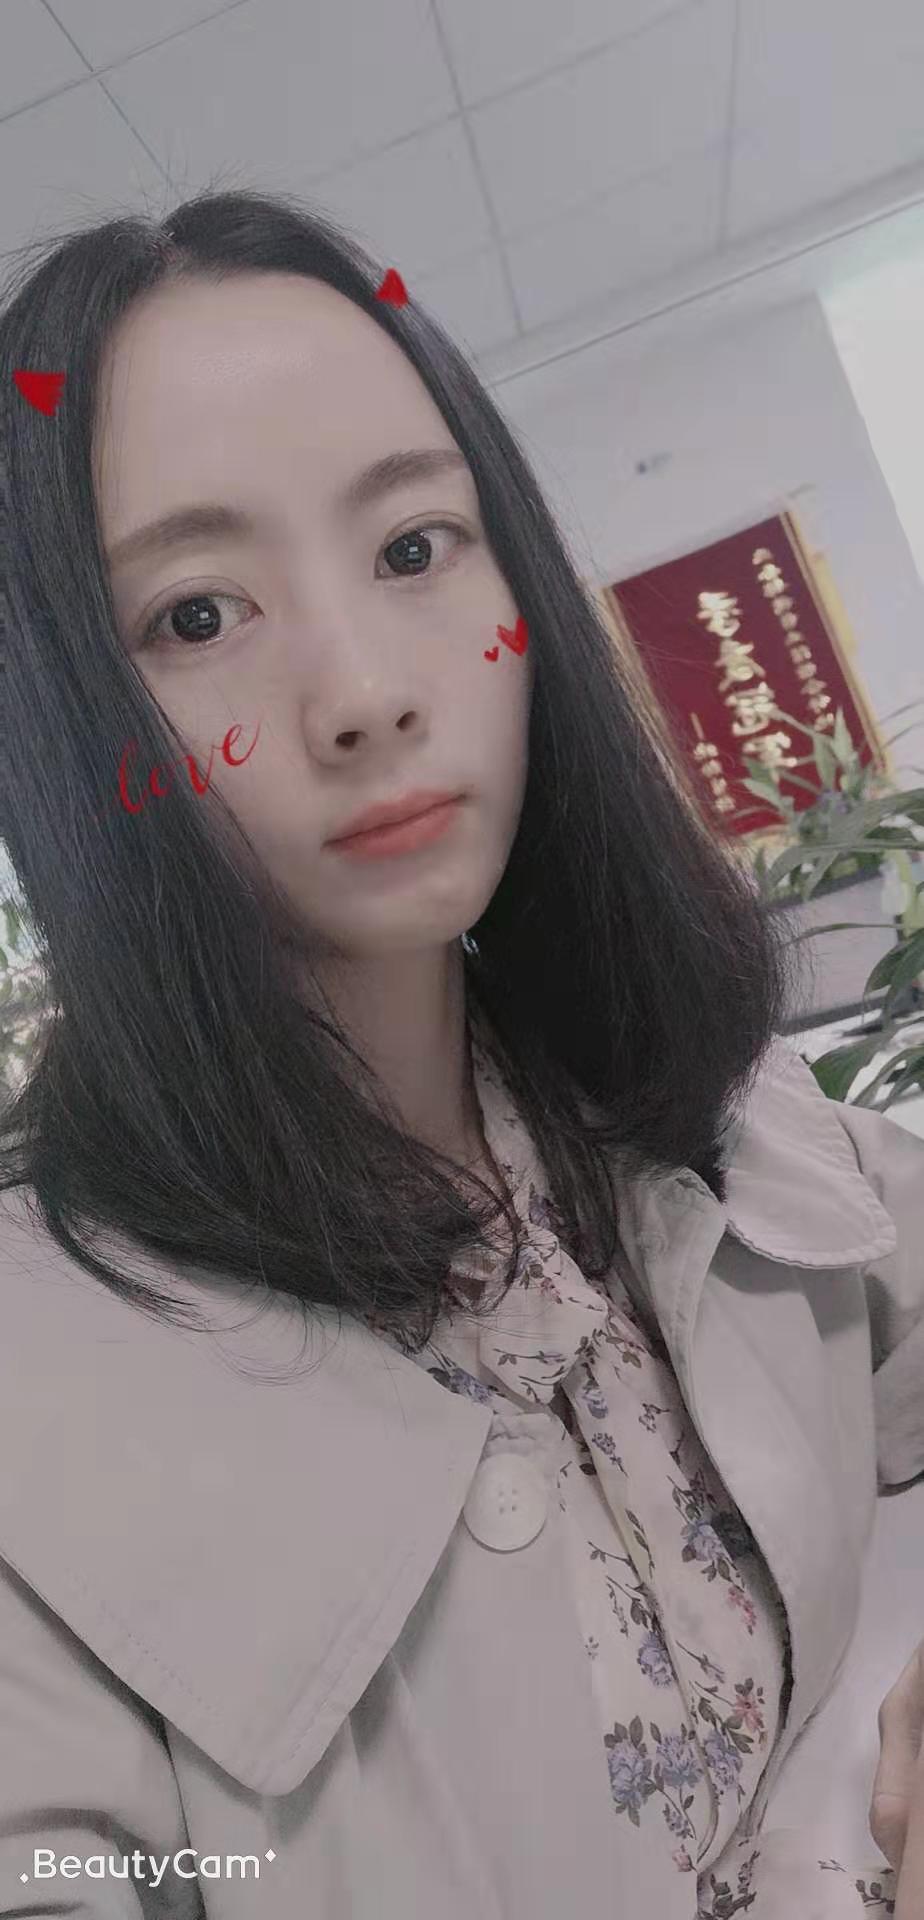 朱炳梅 - www.ravenmoonsmedia.com北纳标物网